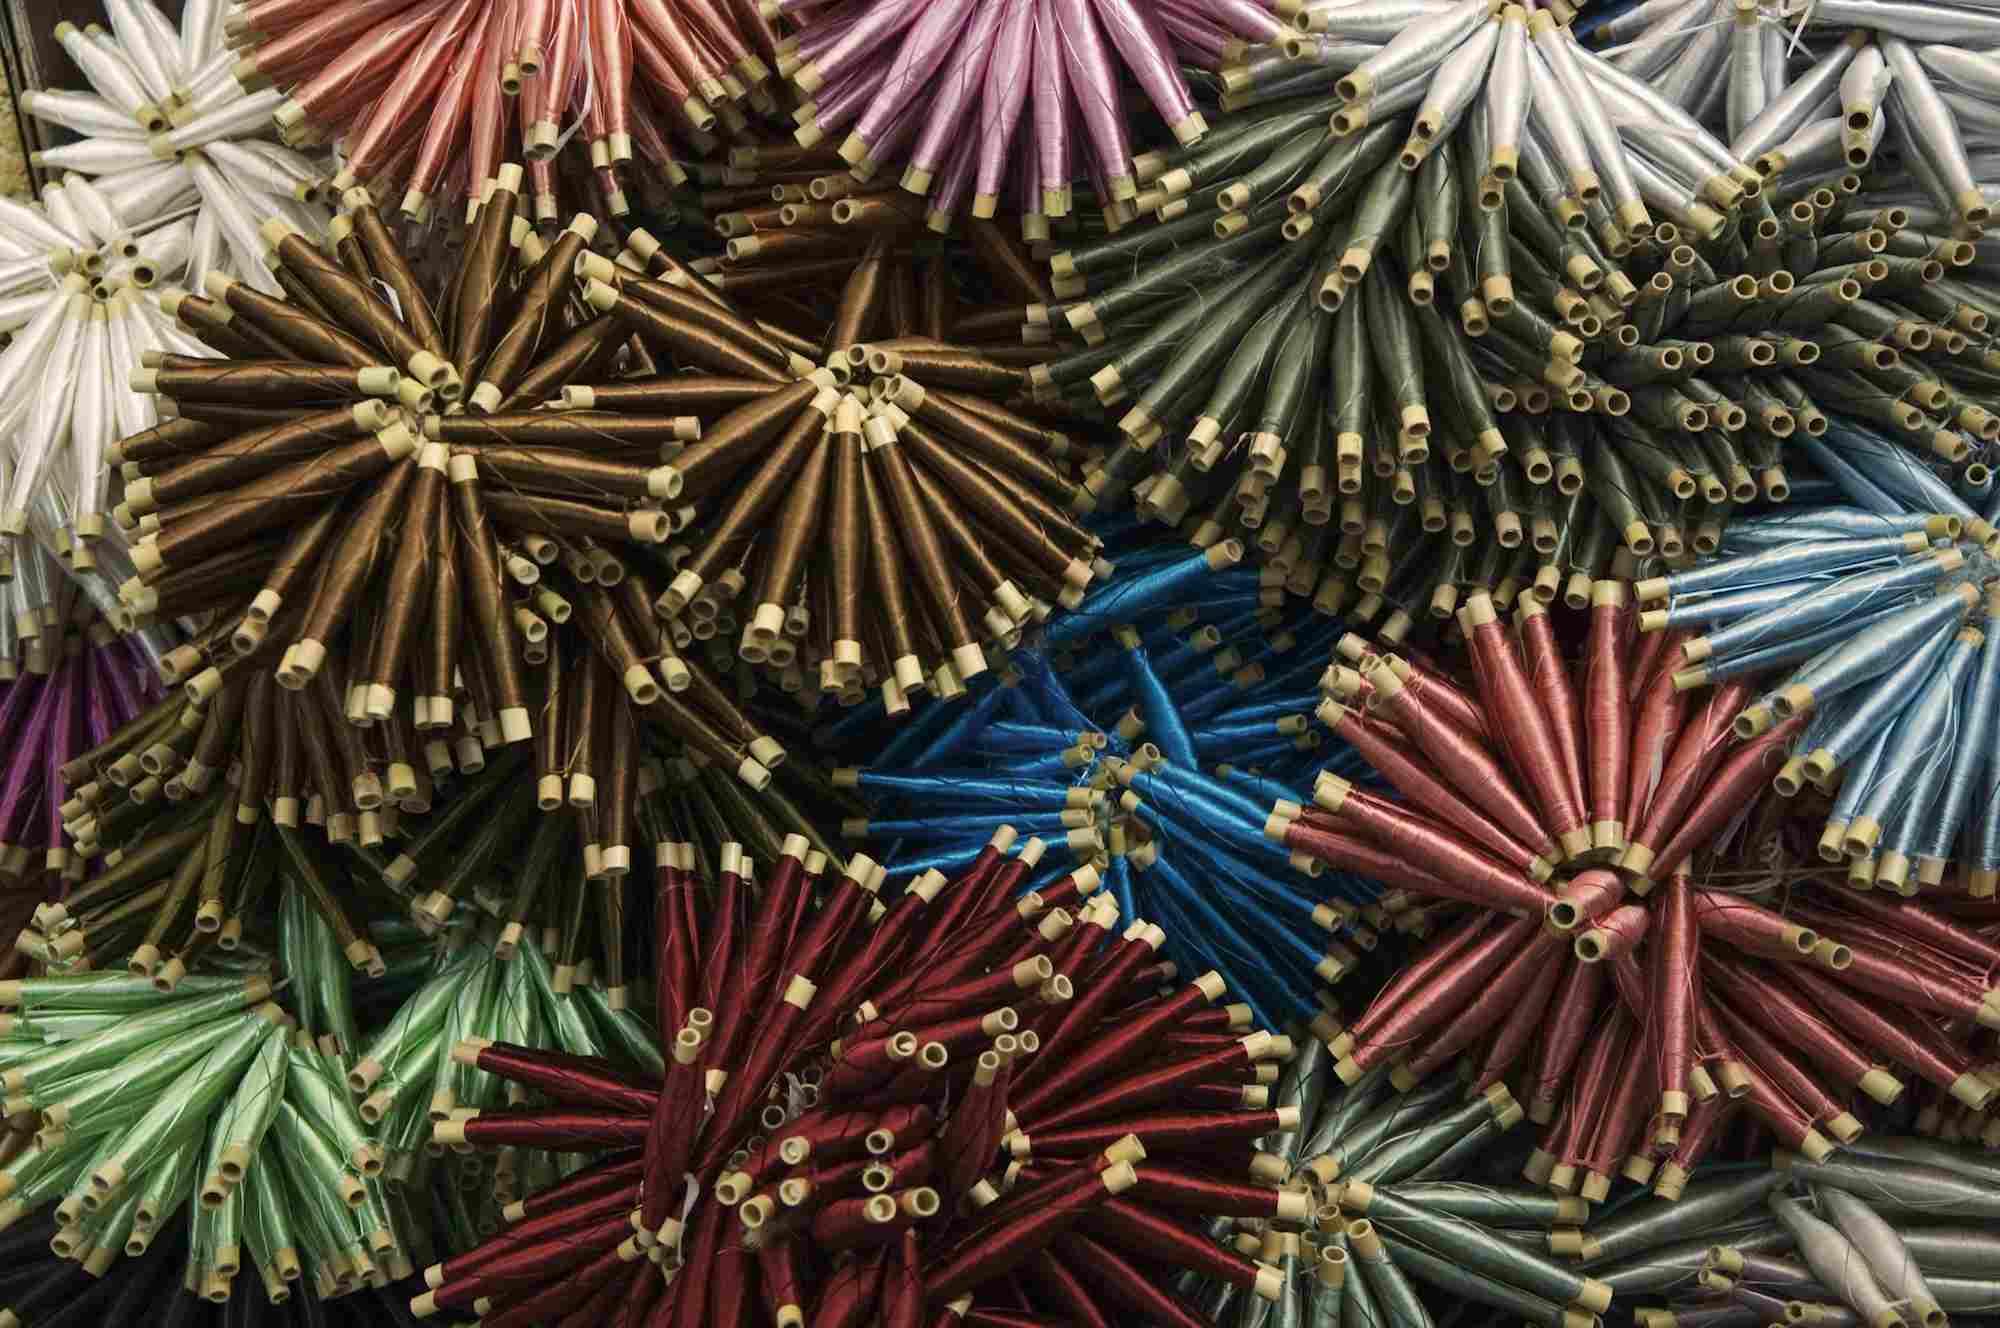 Bobbins of Silk Thread in Bazaar